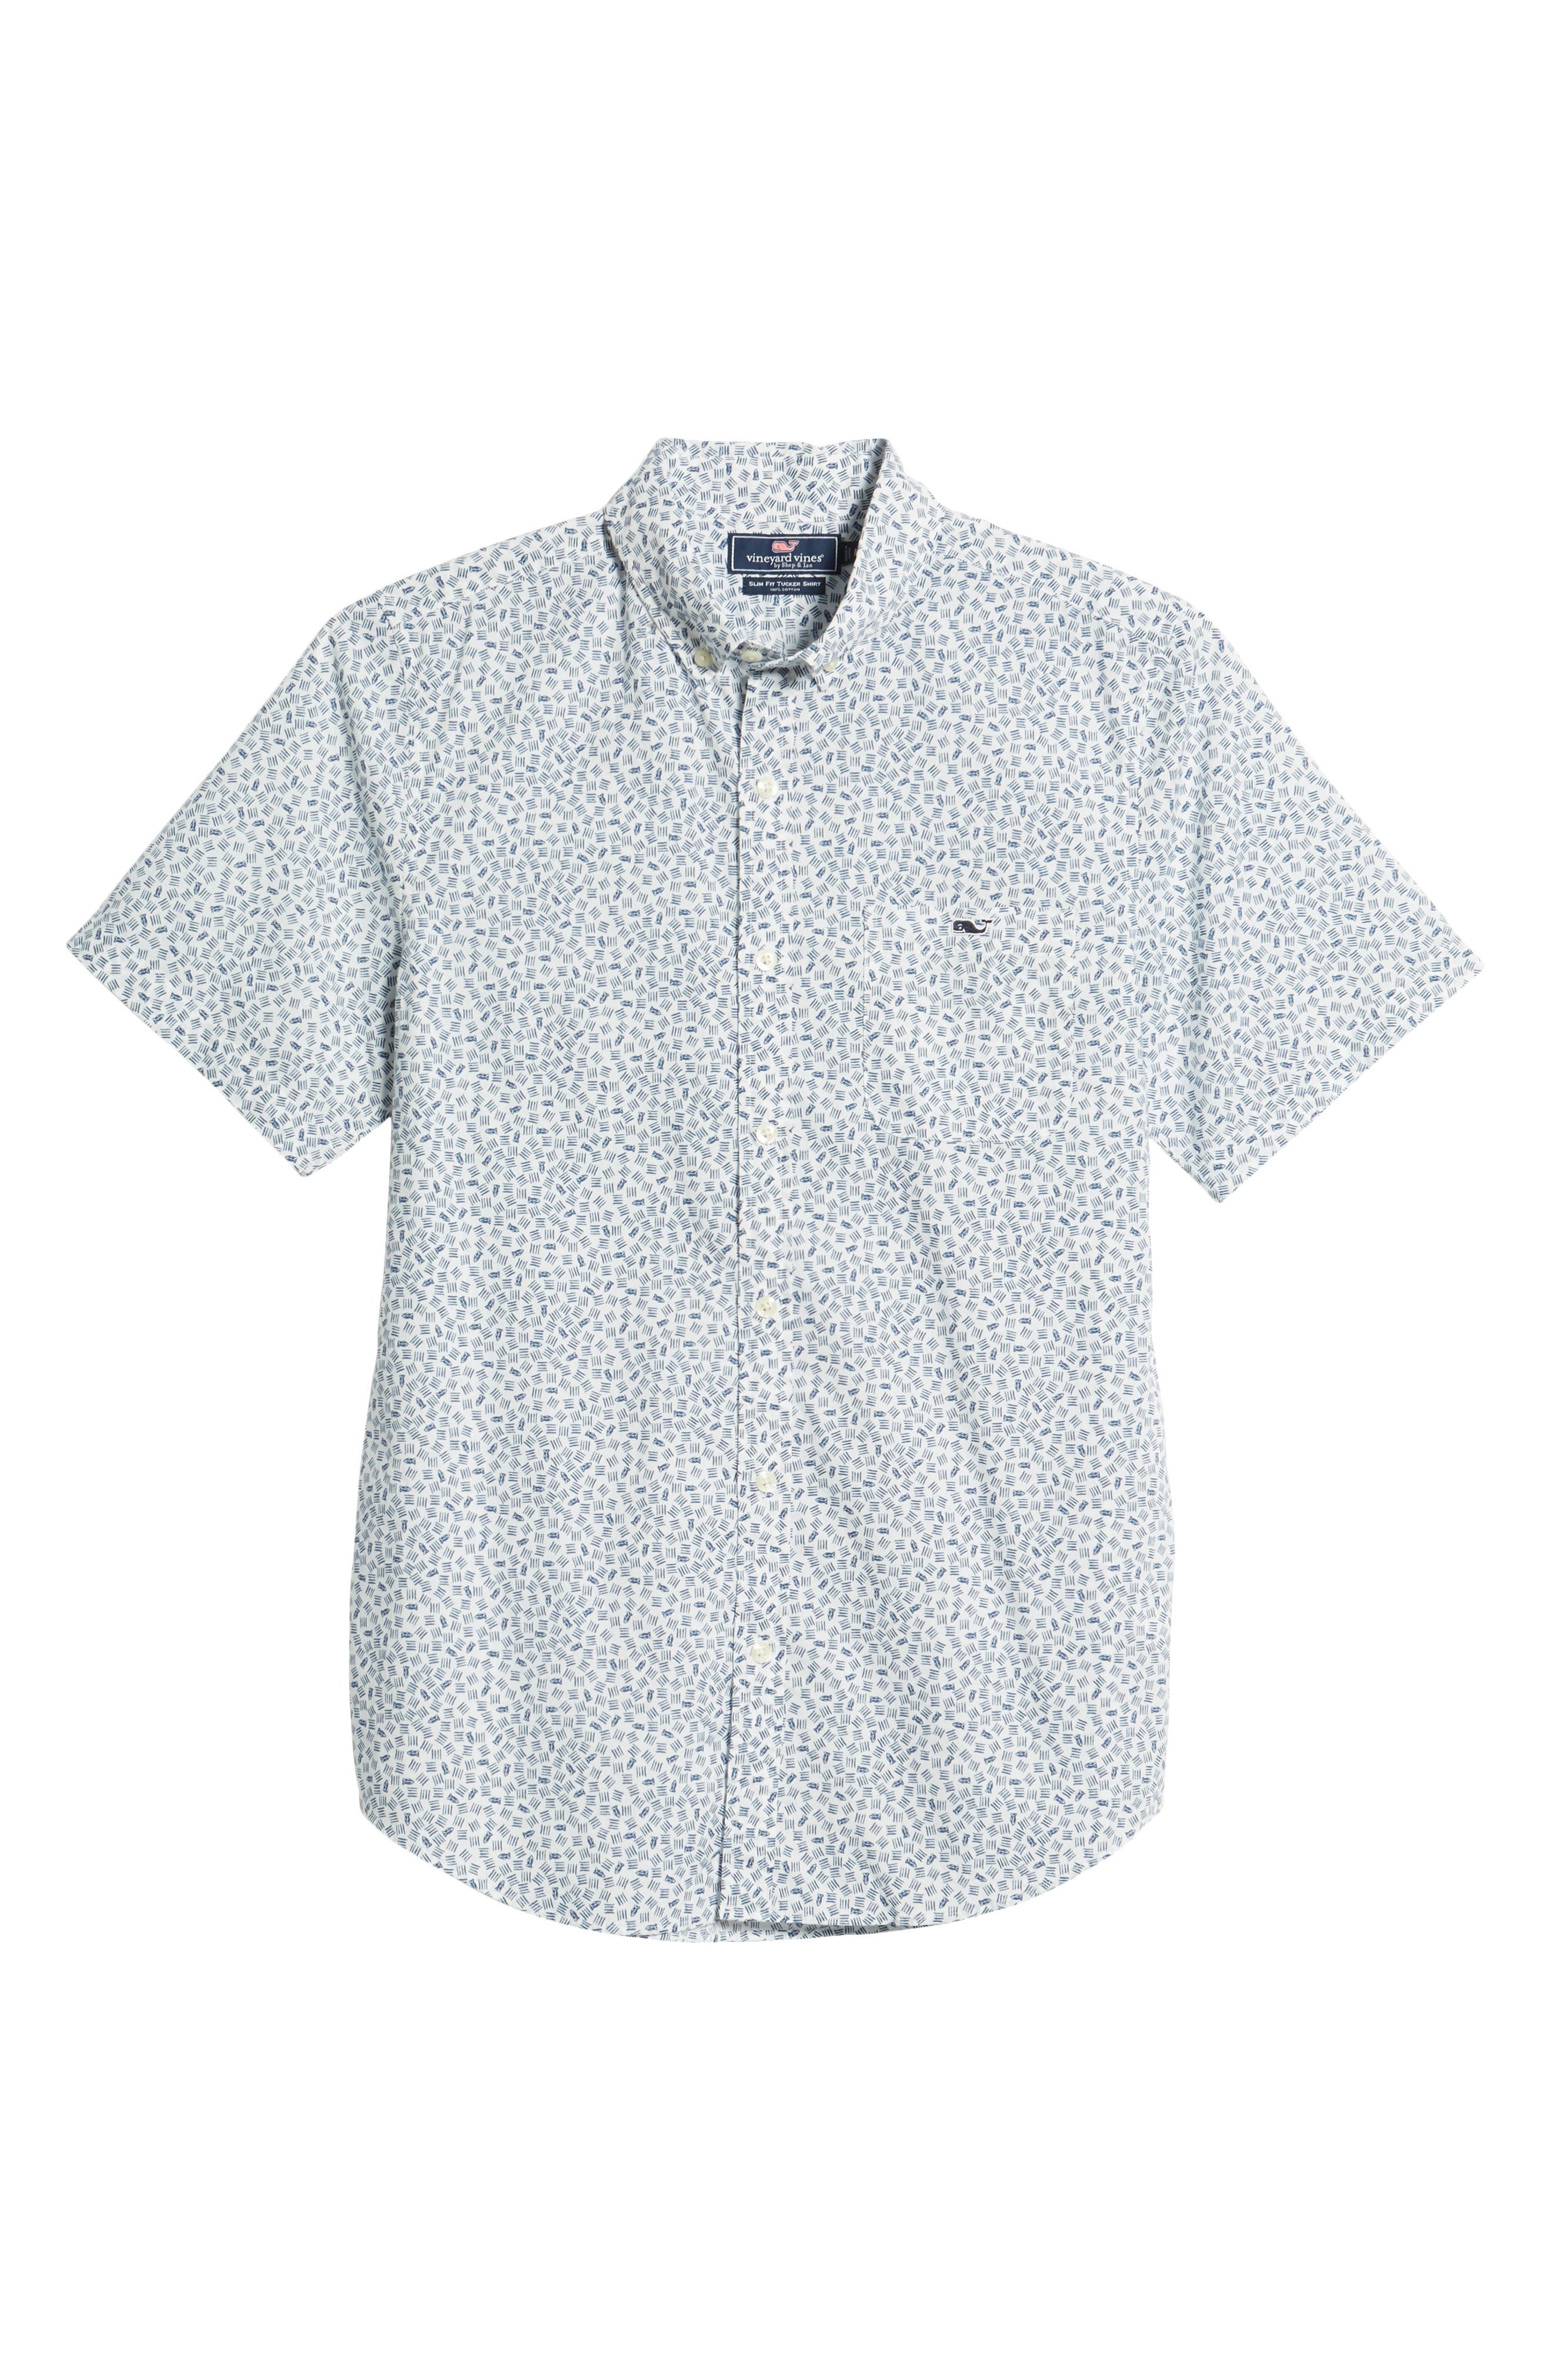 VINEYARD VINES,                             Fish Dash Tucker Slim Fit Sport Shirt,                             Alternate thumbnail 6, color,                             100